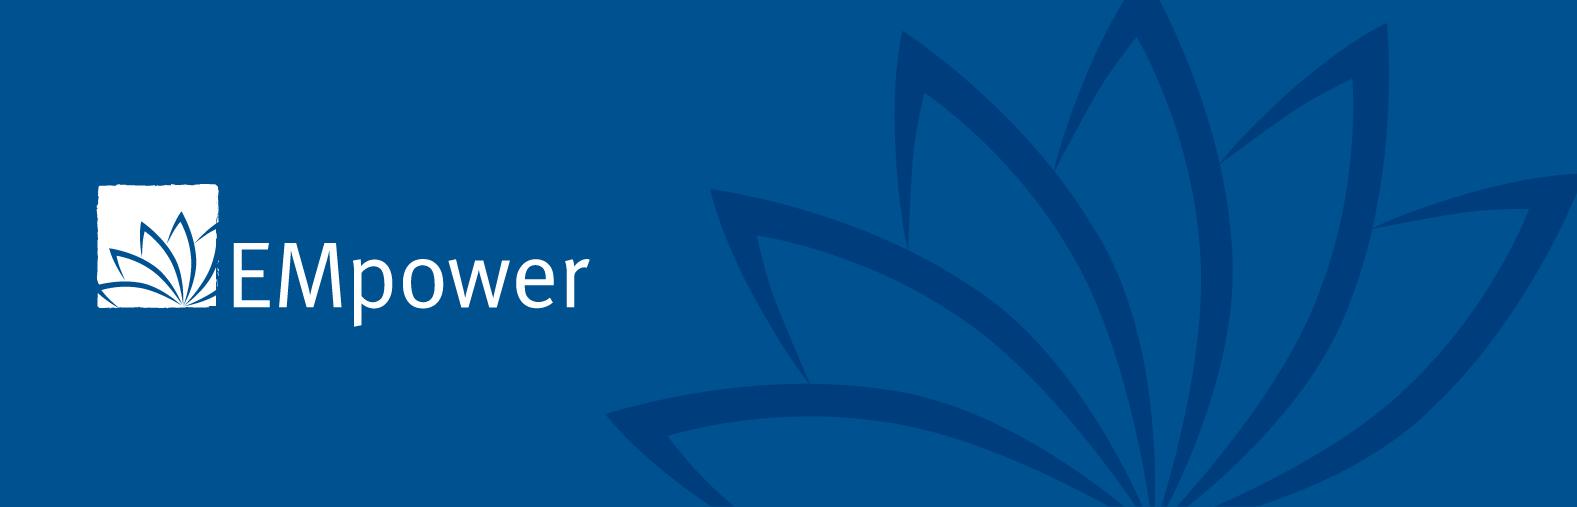 EMpower Logo Blue Ocean_Barefoot